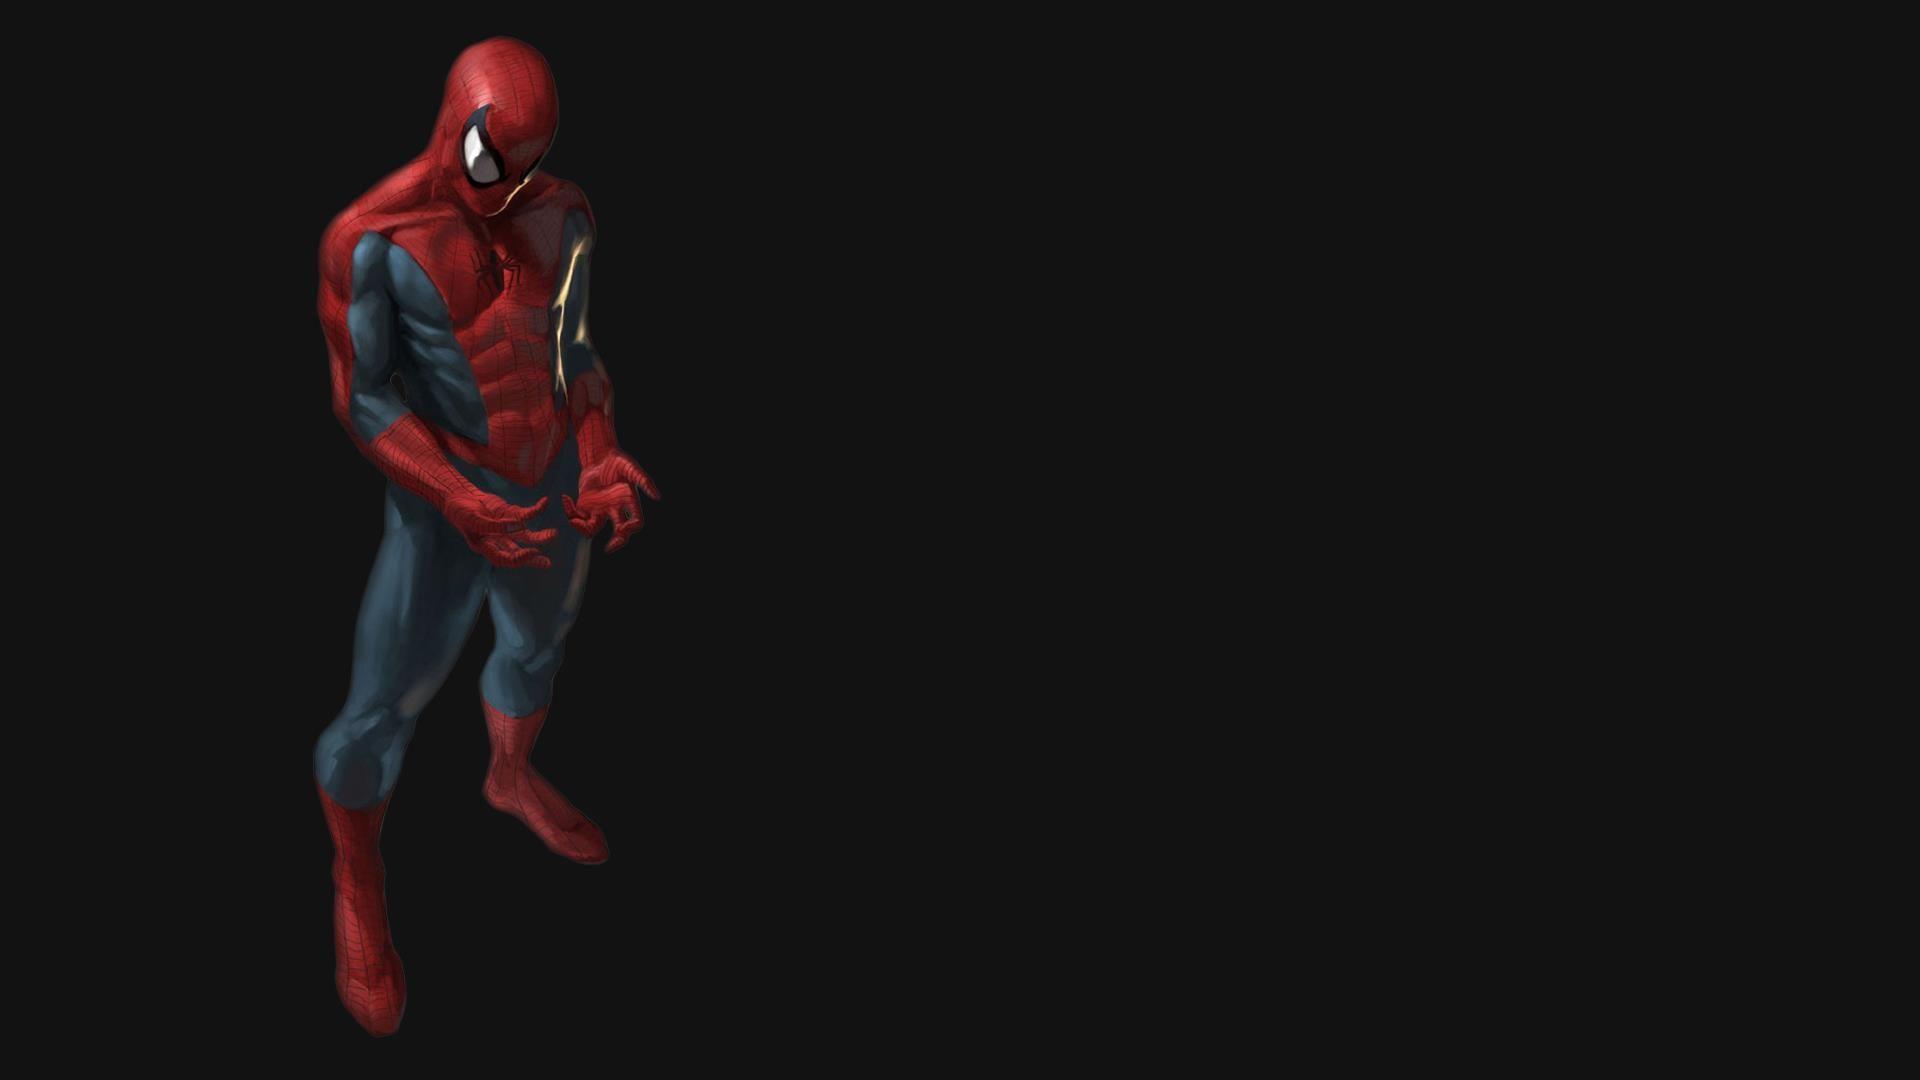 Most Inspiring Wallpaper Home Screen Spiderman - 50b63879da271b554599b5be920f017e  Trends_711320.jpg